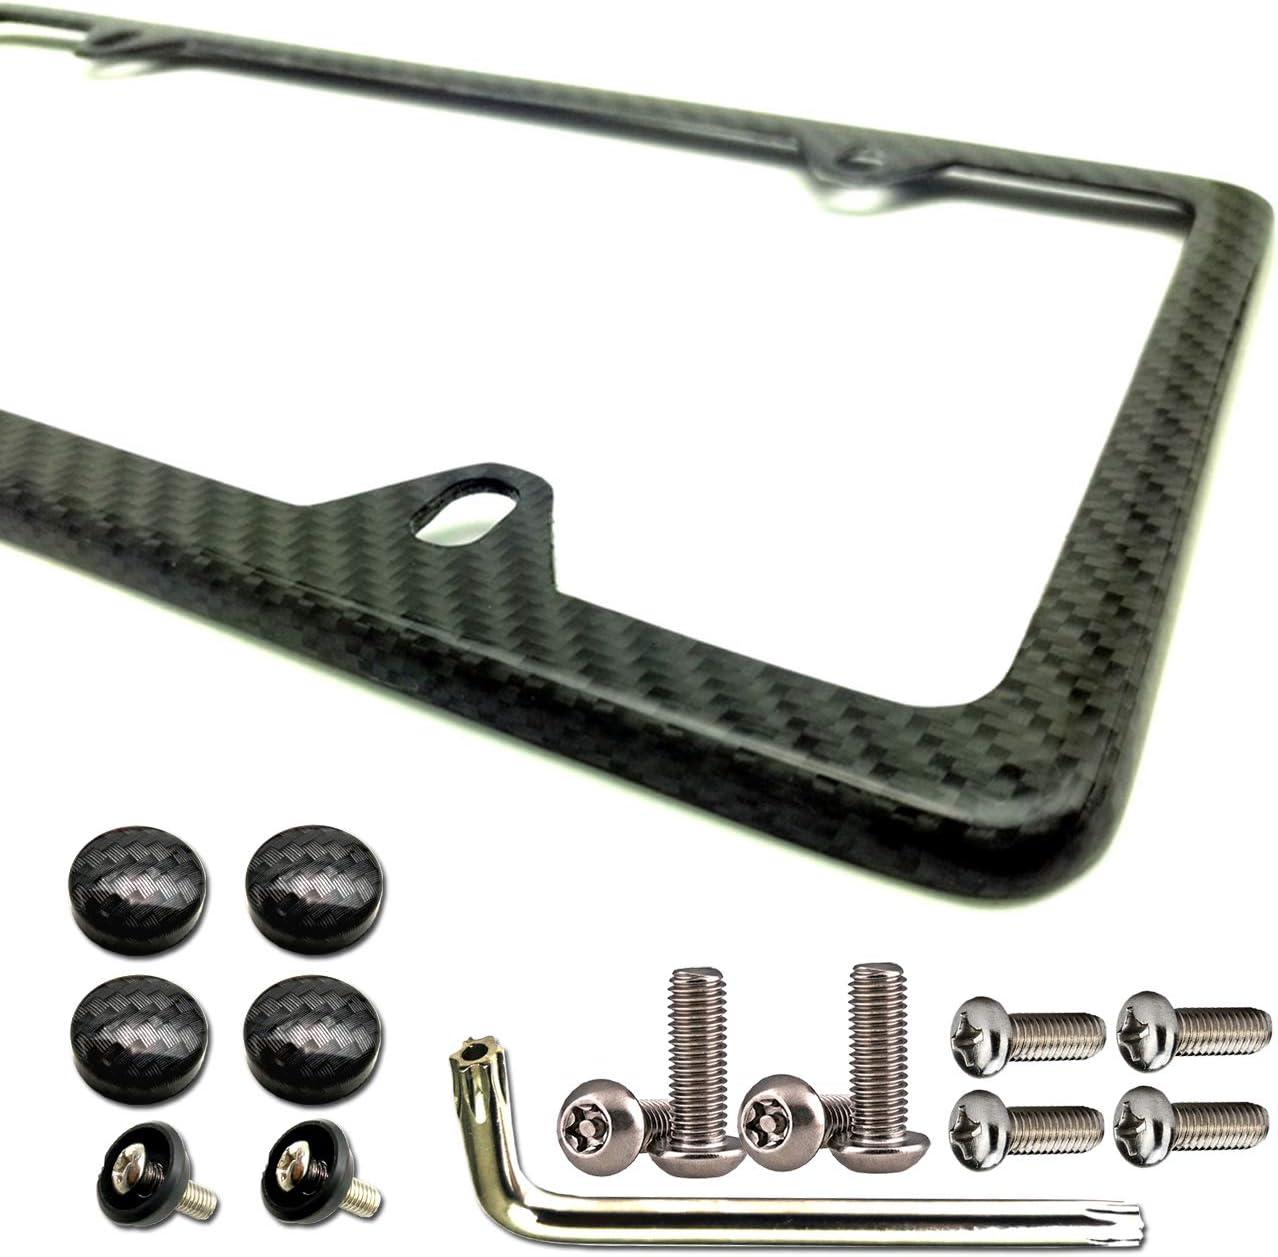 Carbon Fiber License Plate Frame - Aluminum License Plate Frames Handmade Covering 100% Real Carbon Fiber   Stainless Steel Tamper Proof License Plate Screws ,CF Cover   4 Hole Slim Frame 1 Pack